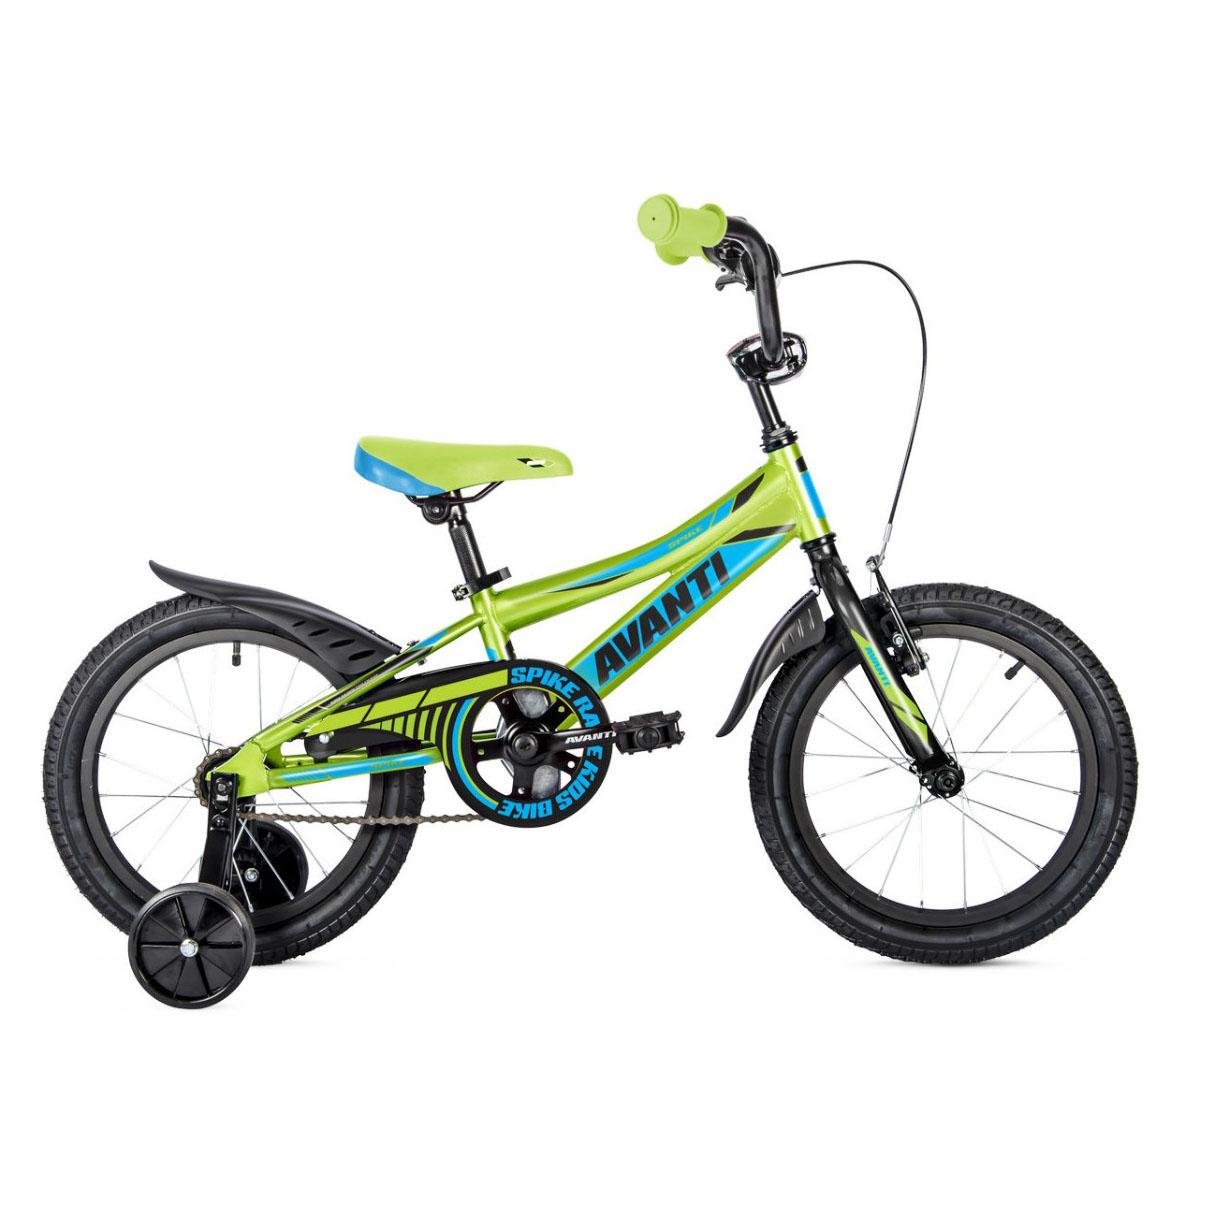 Фото Детский Велосипед 18 Avanti Spike 2018  зелено-синий